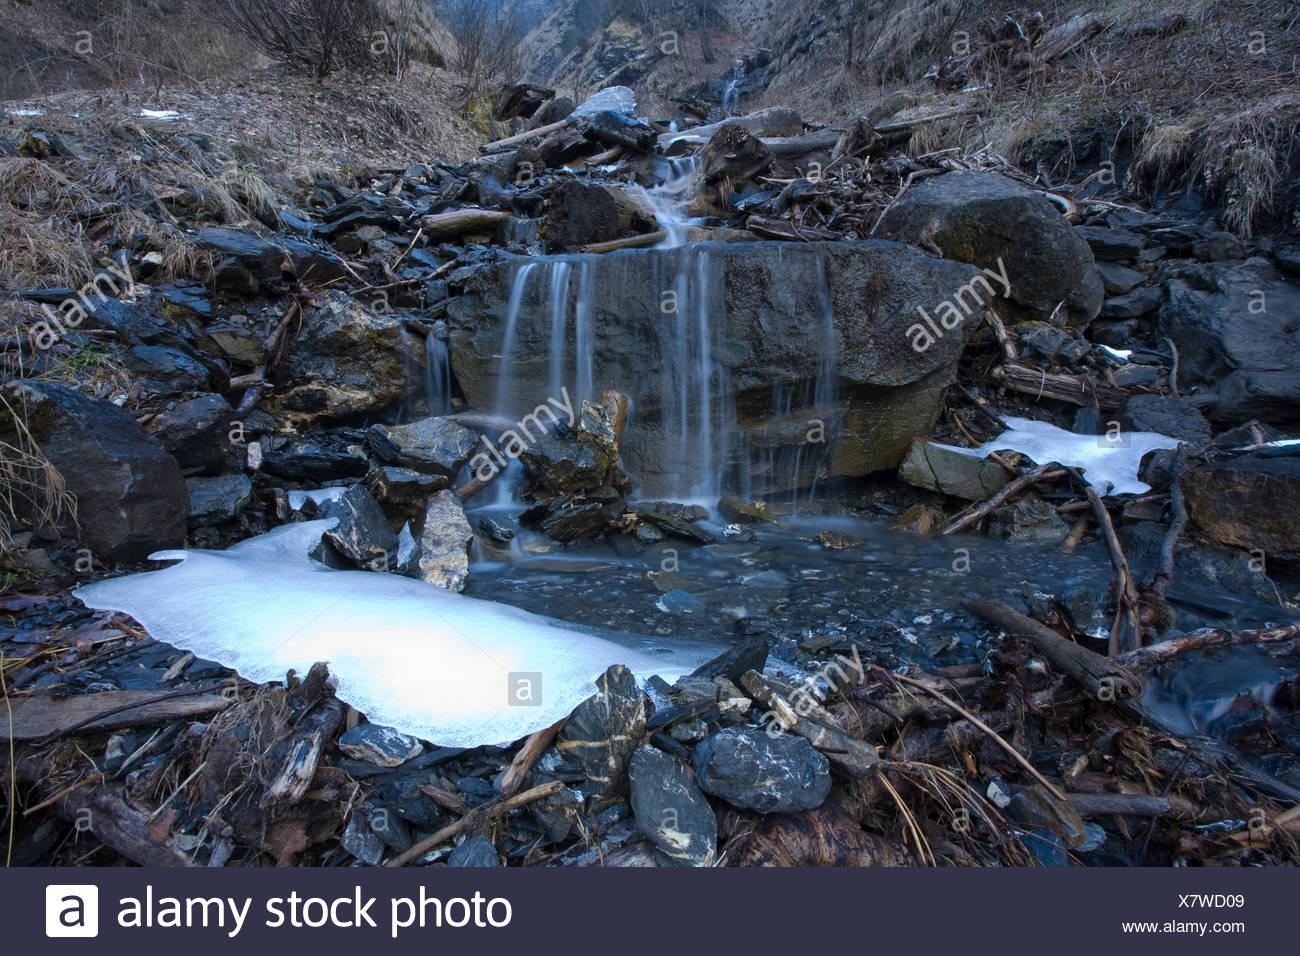 Waterfall Into River Stockfotos & Waterfall Into River Bilder ...